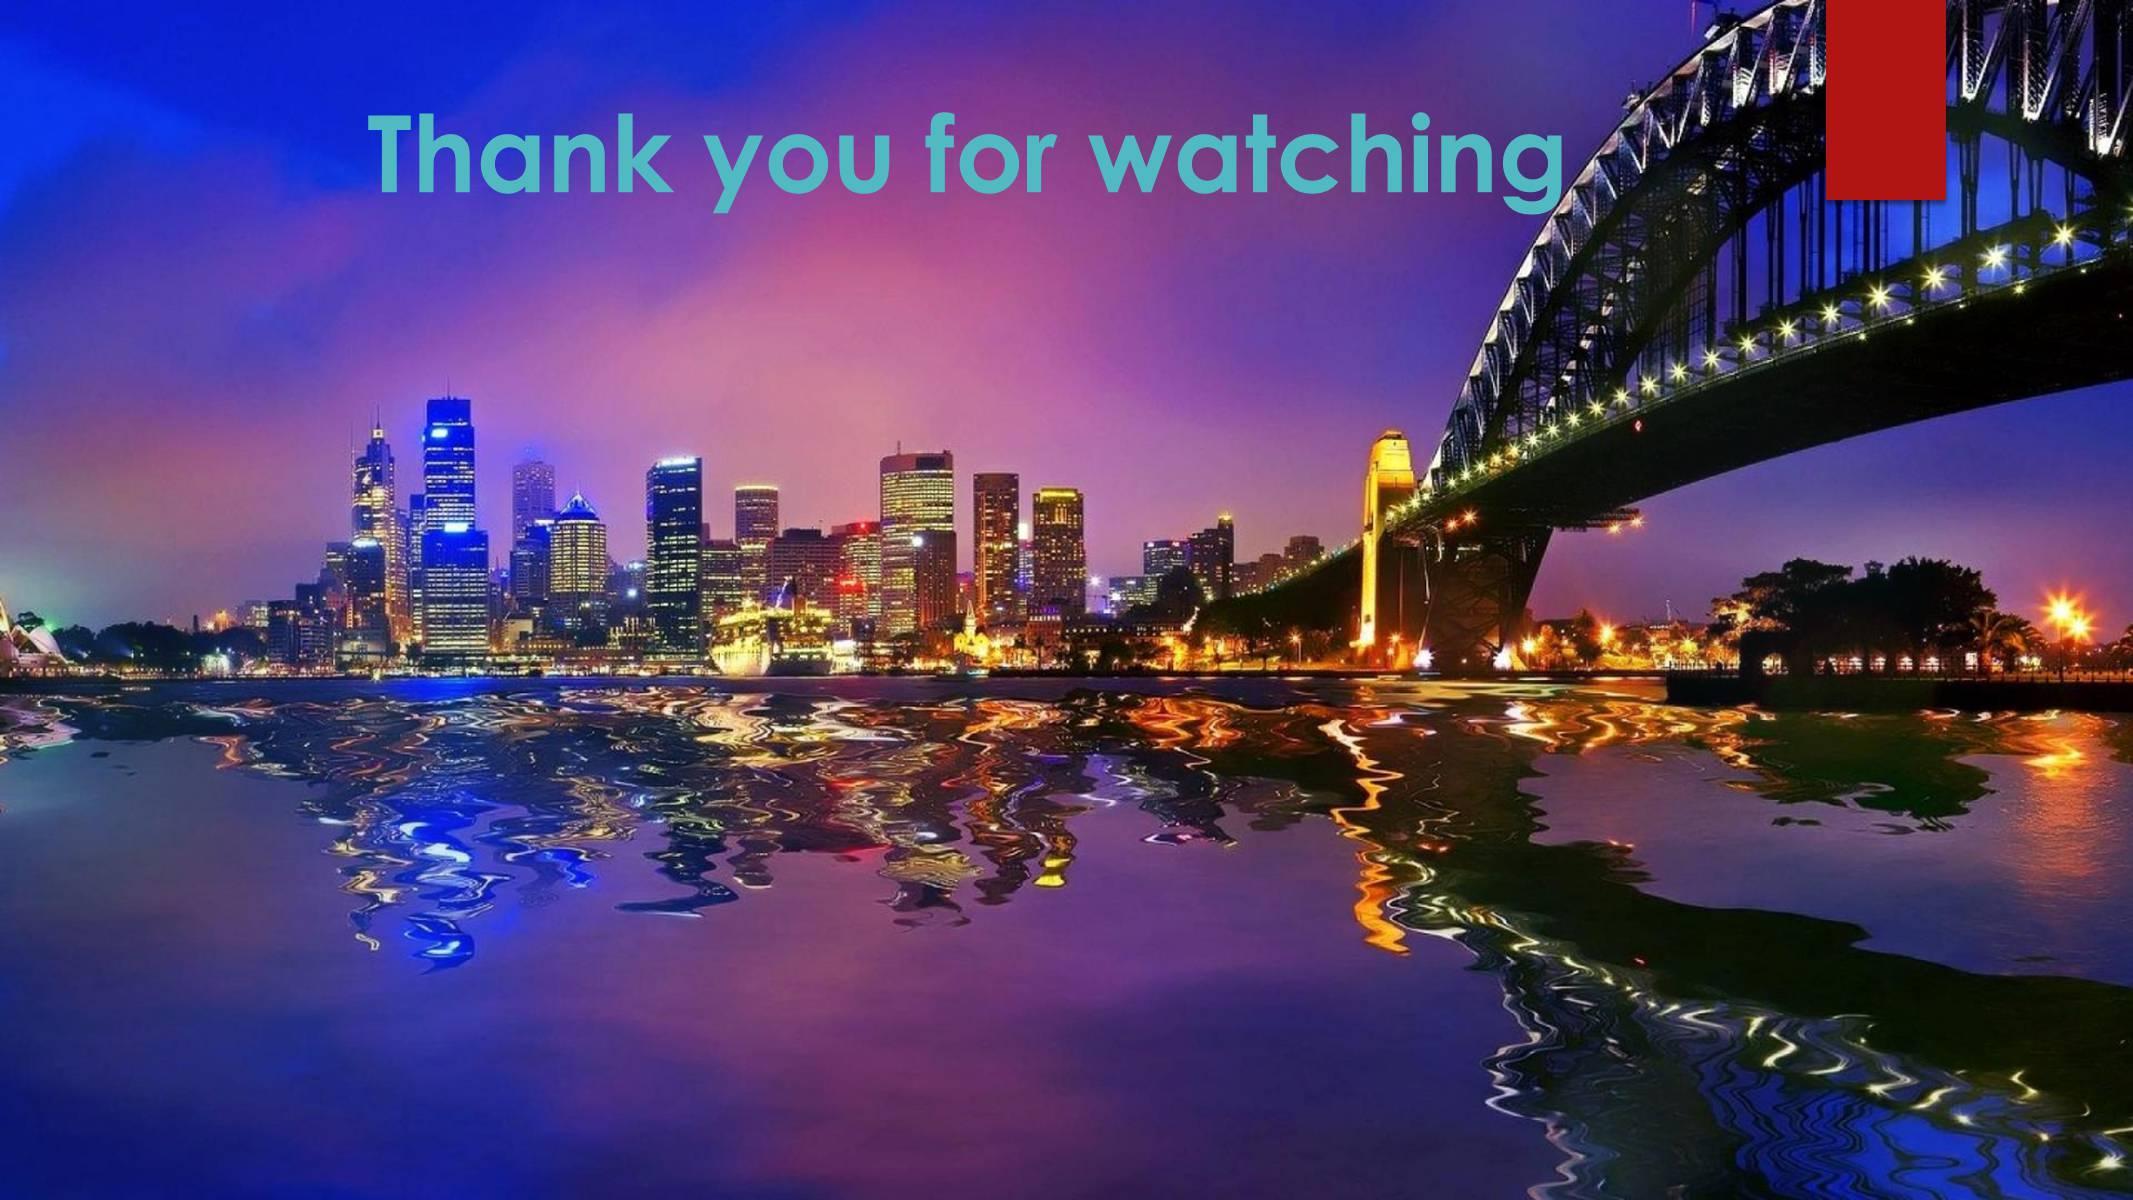 страны архитектура Австралия Мельбурн небо облака природа без смс